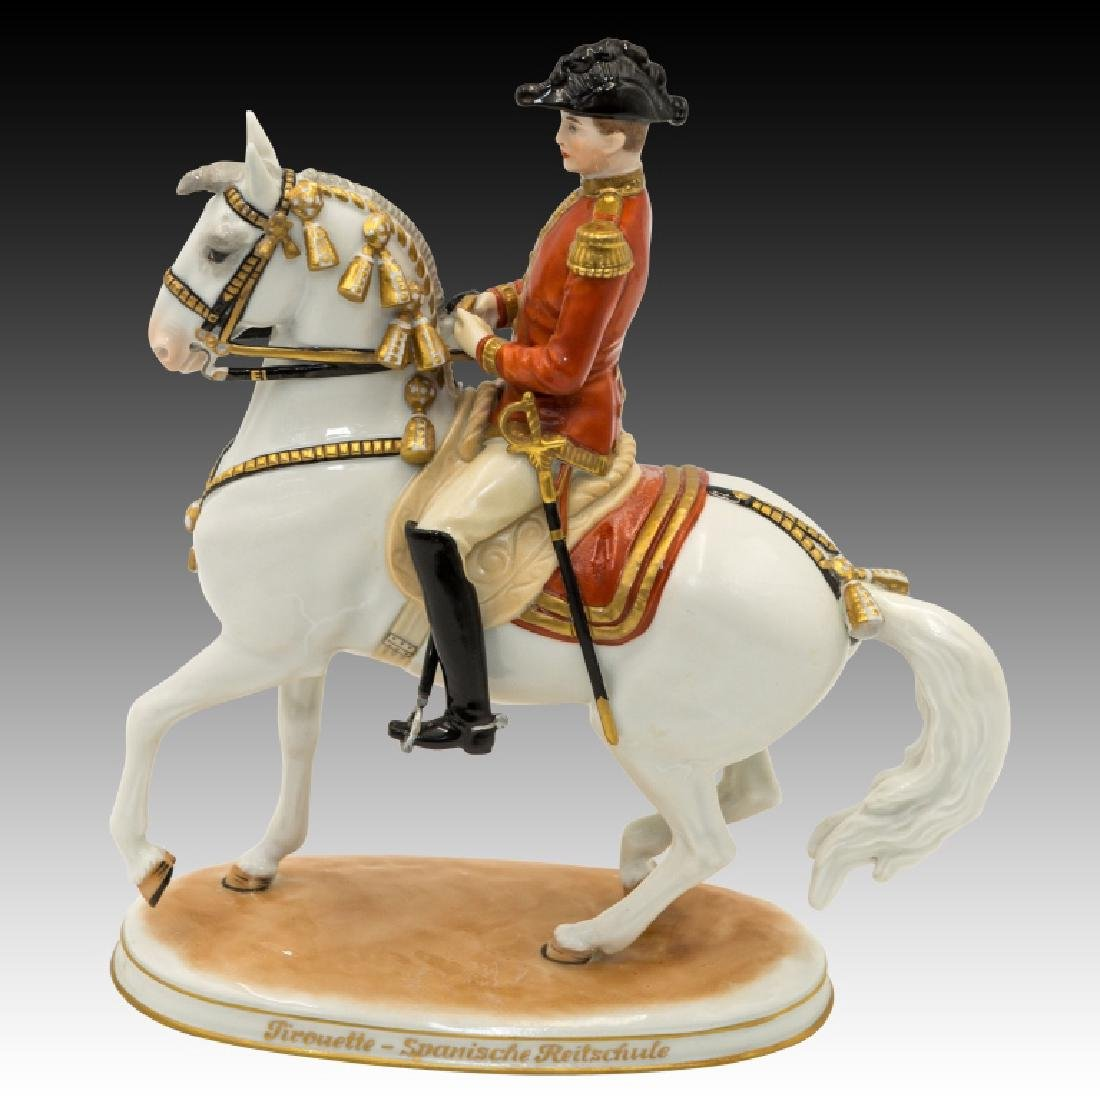 2 Figurines Napoleon and Ticouette - 3